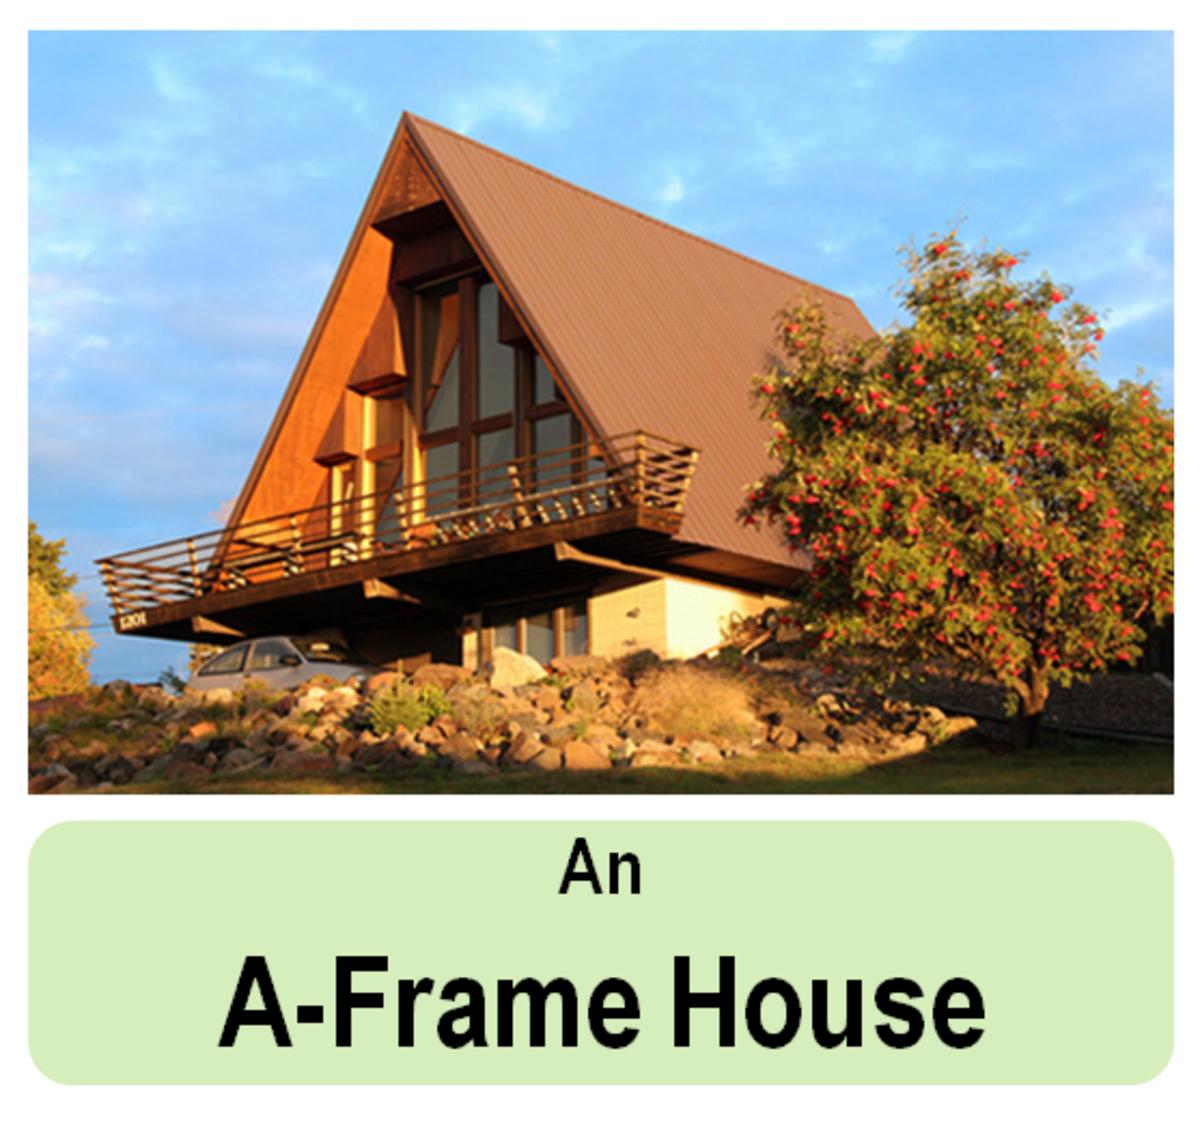 Timber Frame Homes: A-Frame House Designs